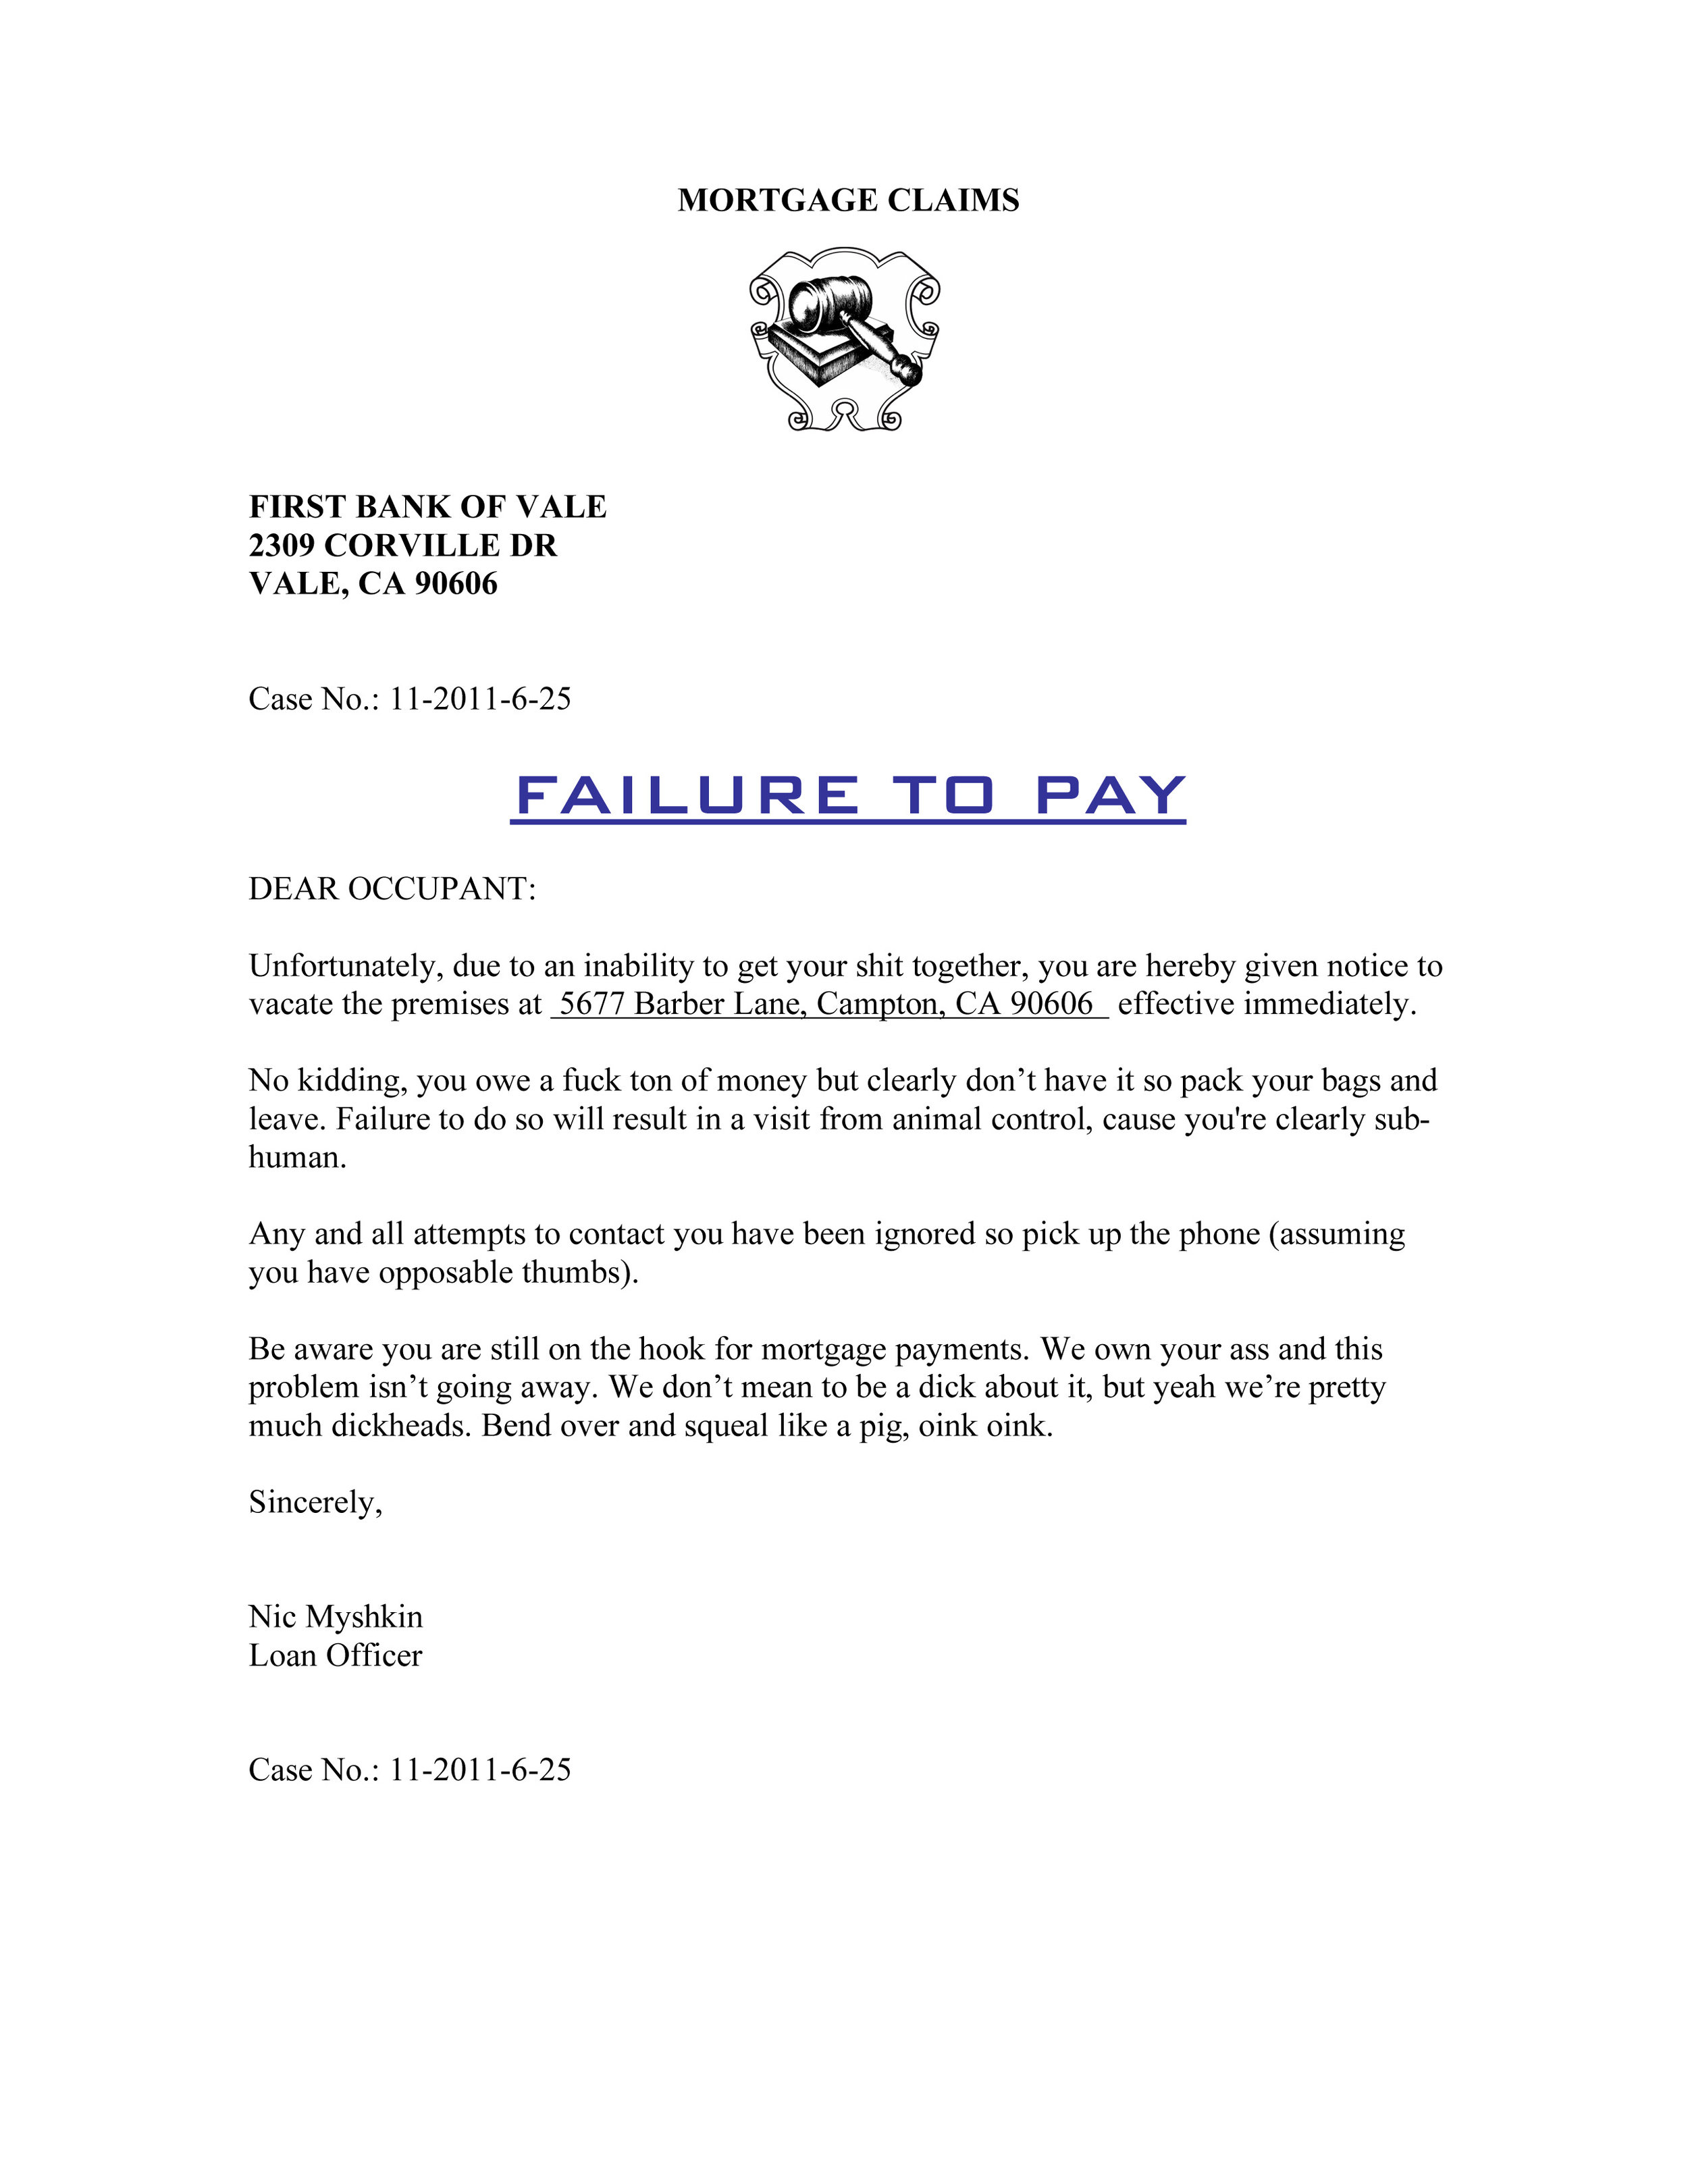 JG failure.jpg